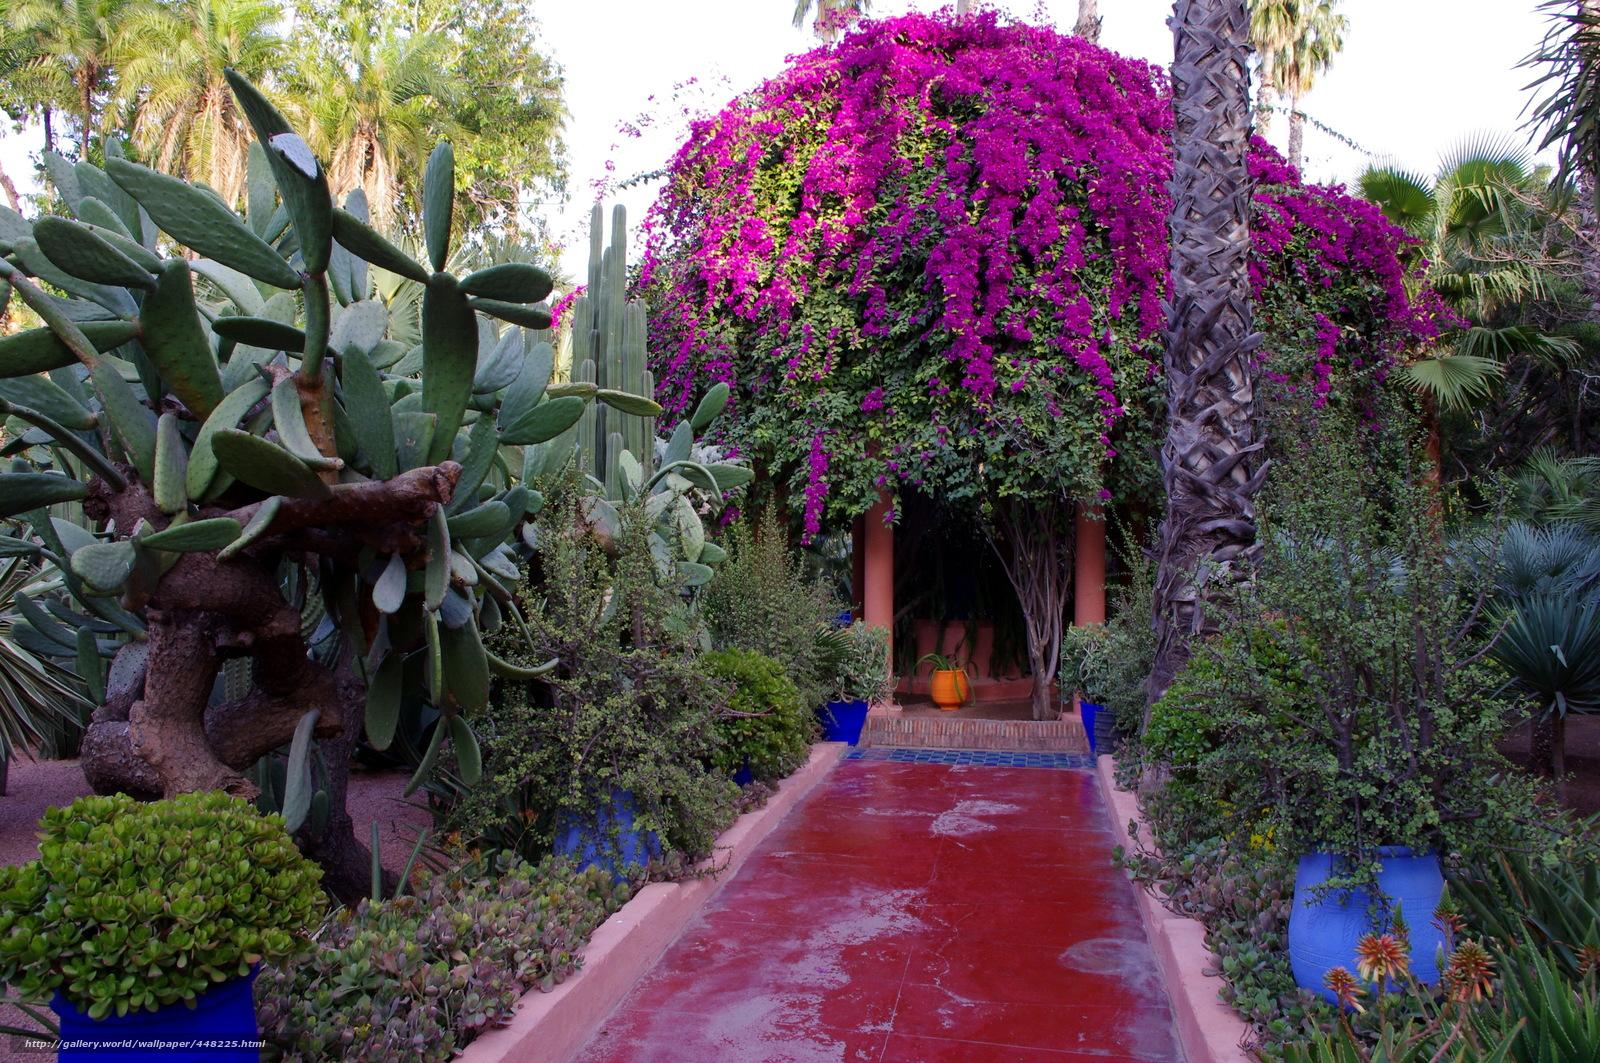 tlcharger fond d 39 ecran jardin maroc marrakech jardin majorelle fonds d 39 ecran gratuits pour. Black Bedroom Furniture Sets. Home Design Ideas